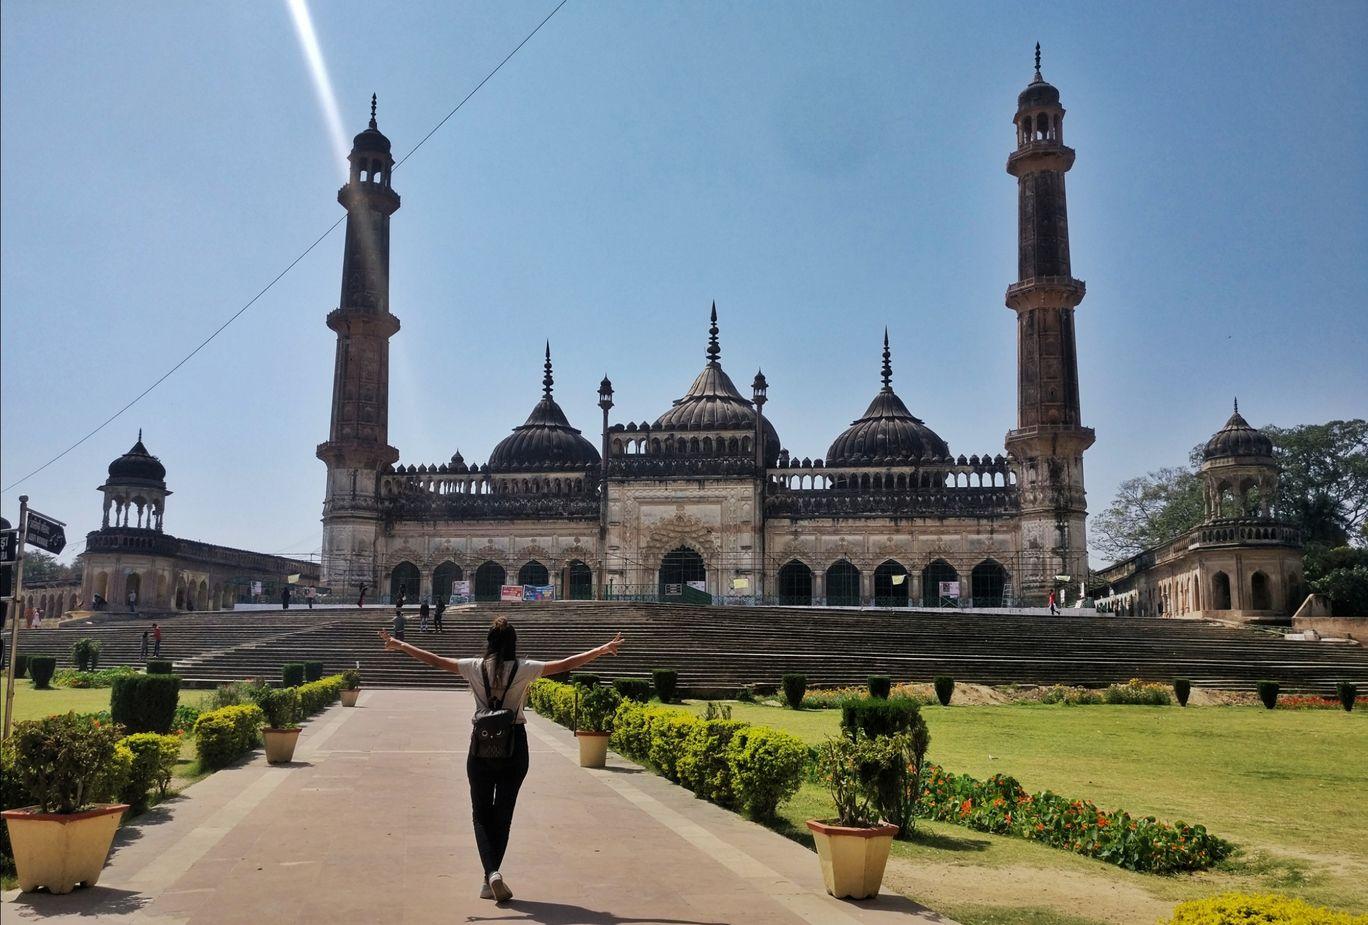 Photo of Lucknow By ragini choudhari